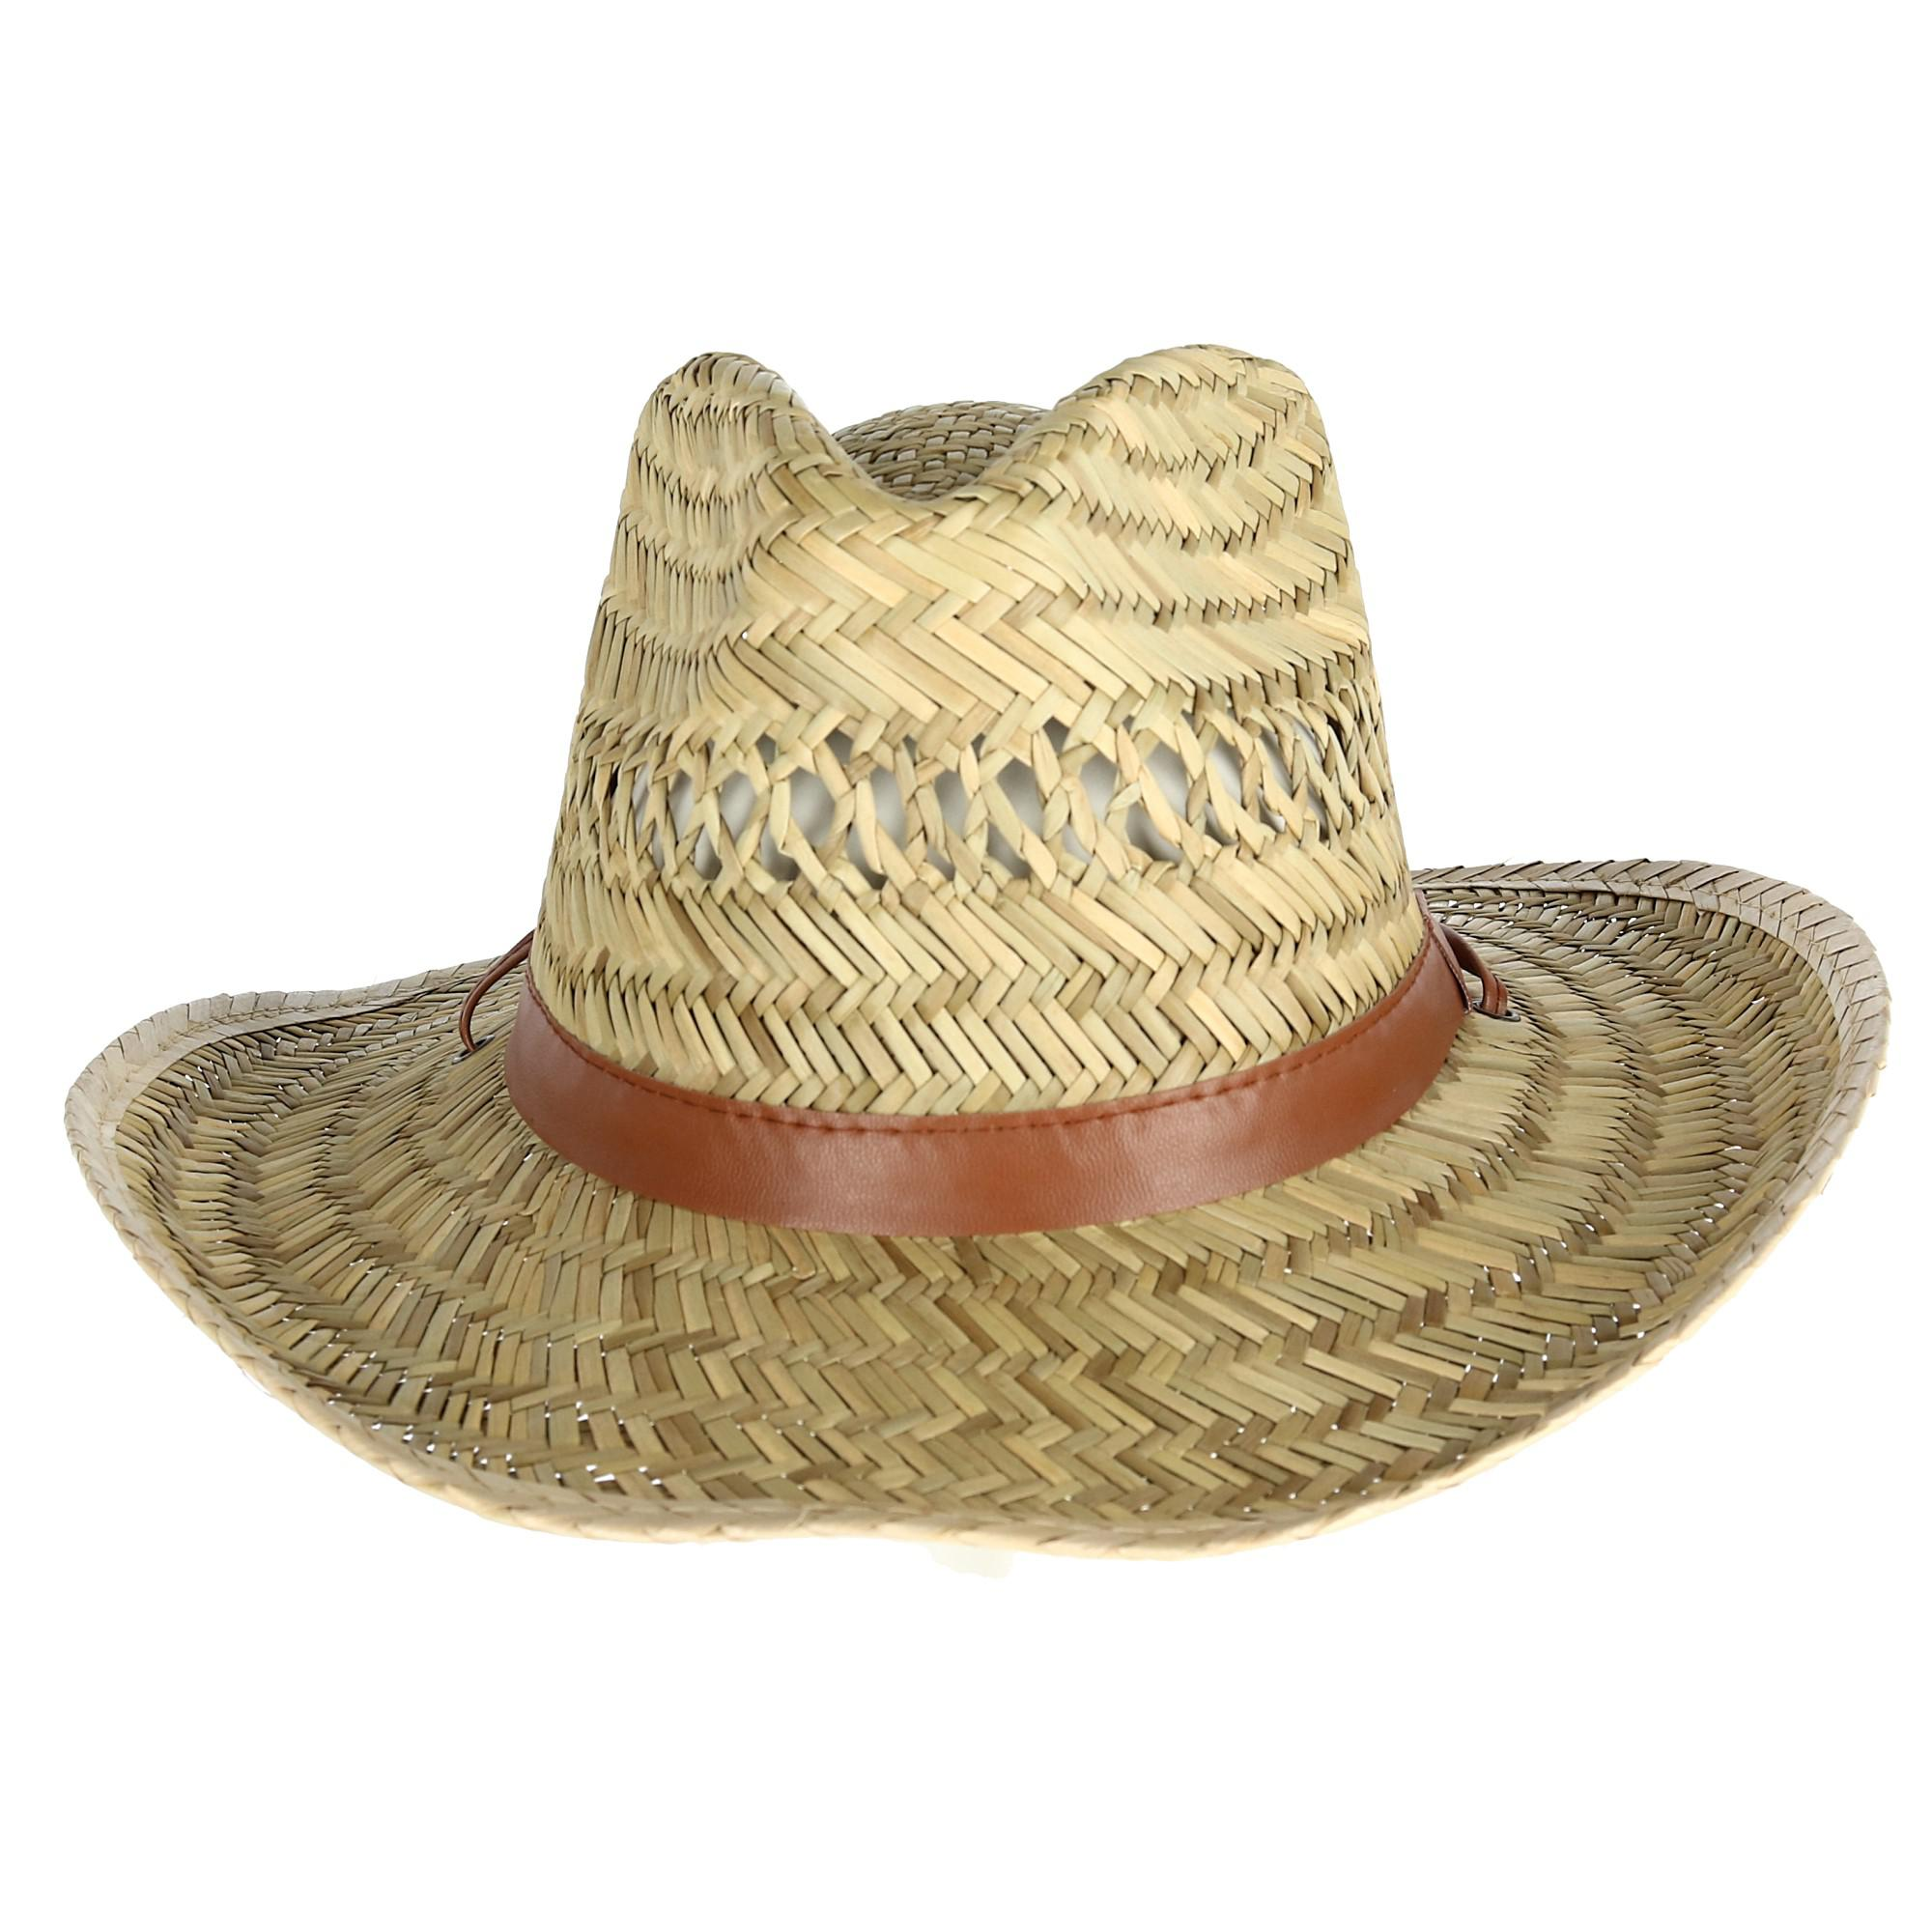 Kenny K Men's Rush Straw Lightweight Safari Hat with Chin Cord - image 5 of 5